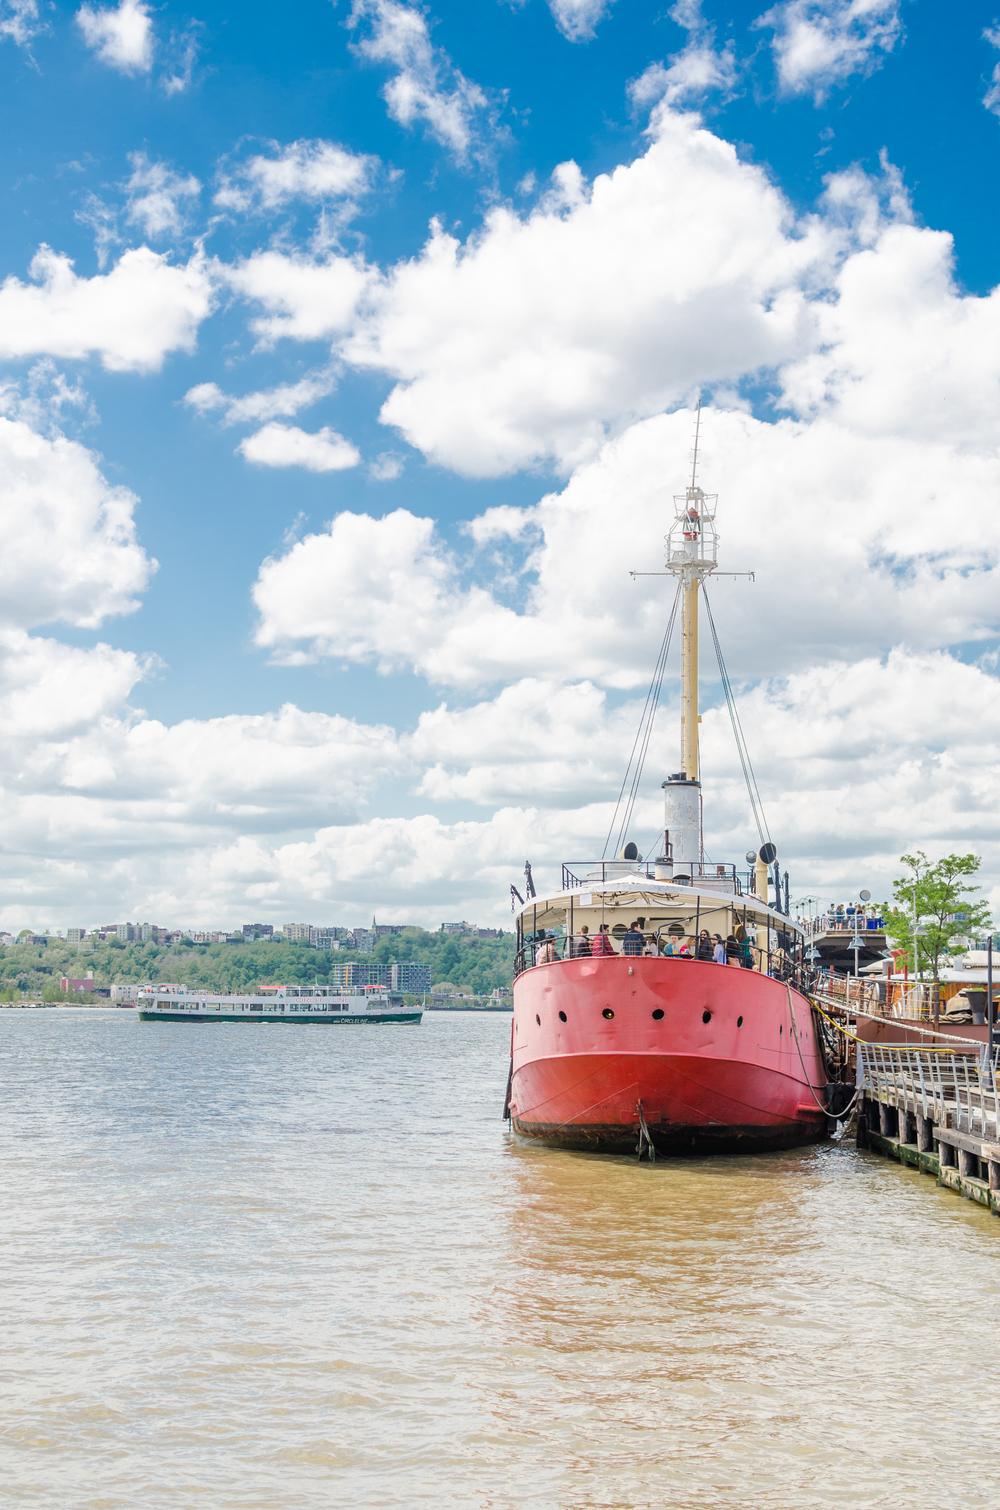 fryingpanboat.jpg